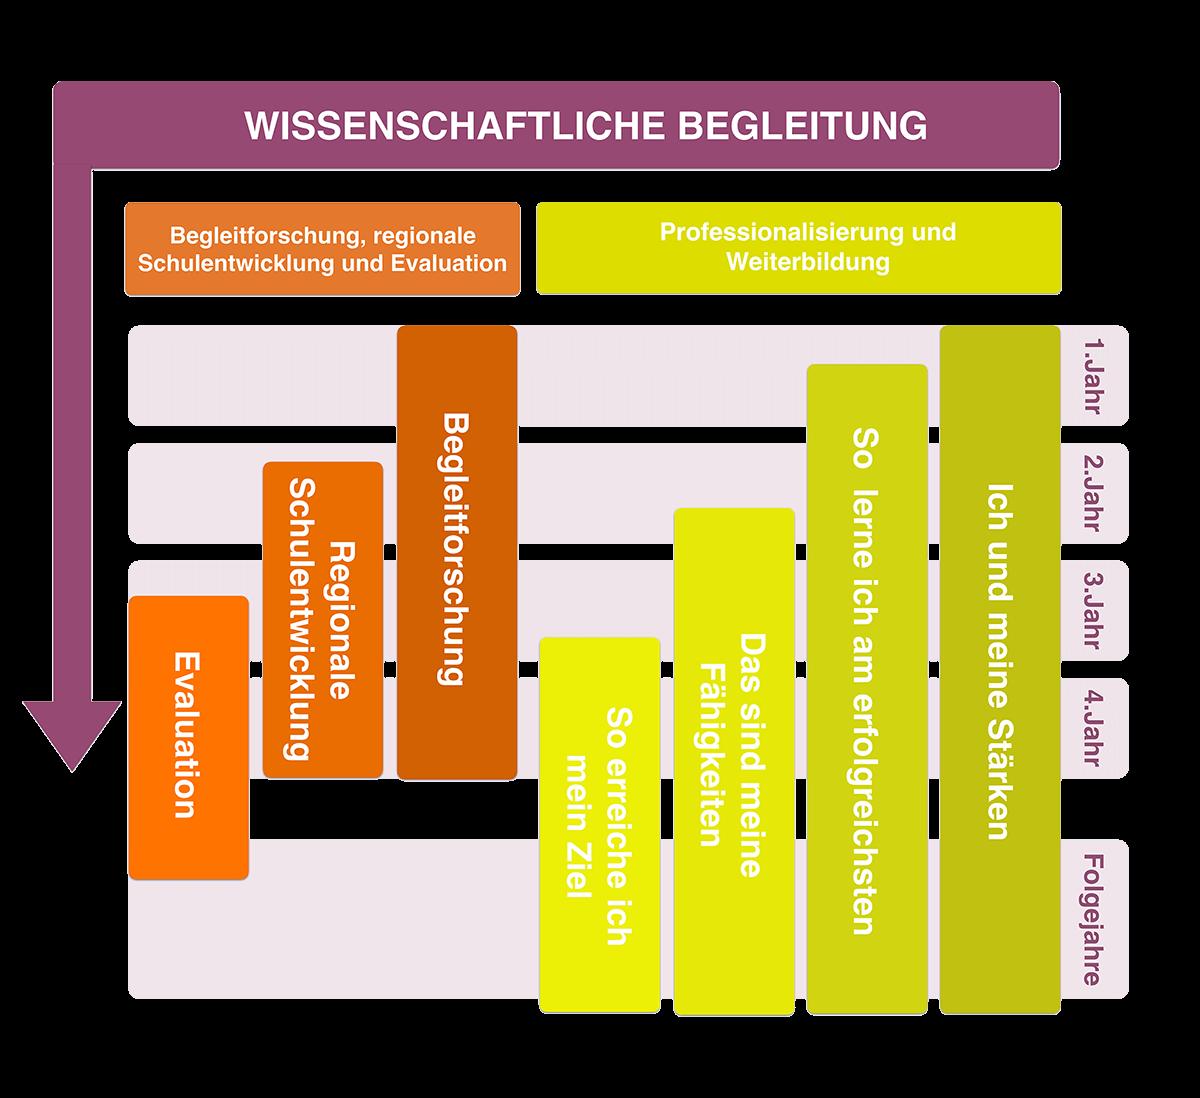 https://www.mbz-tirol.at/wp-content/uploads/2017/04/Wissenschaftliche-Begleitung_LL_HR.png